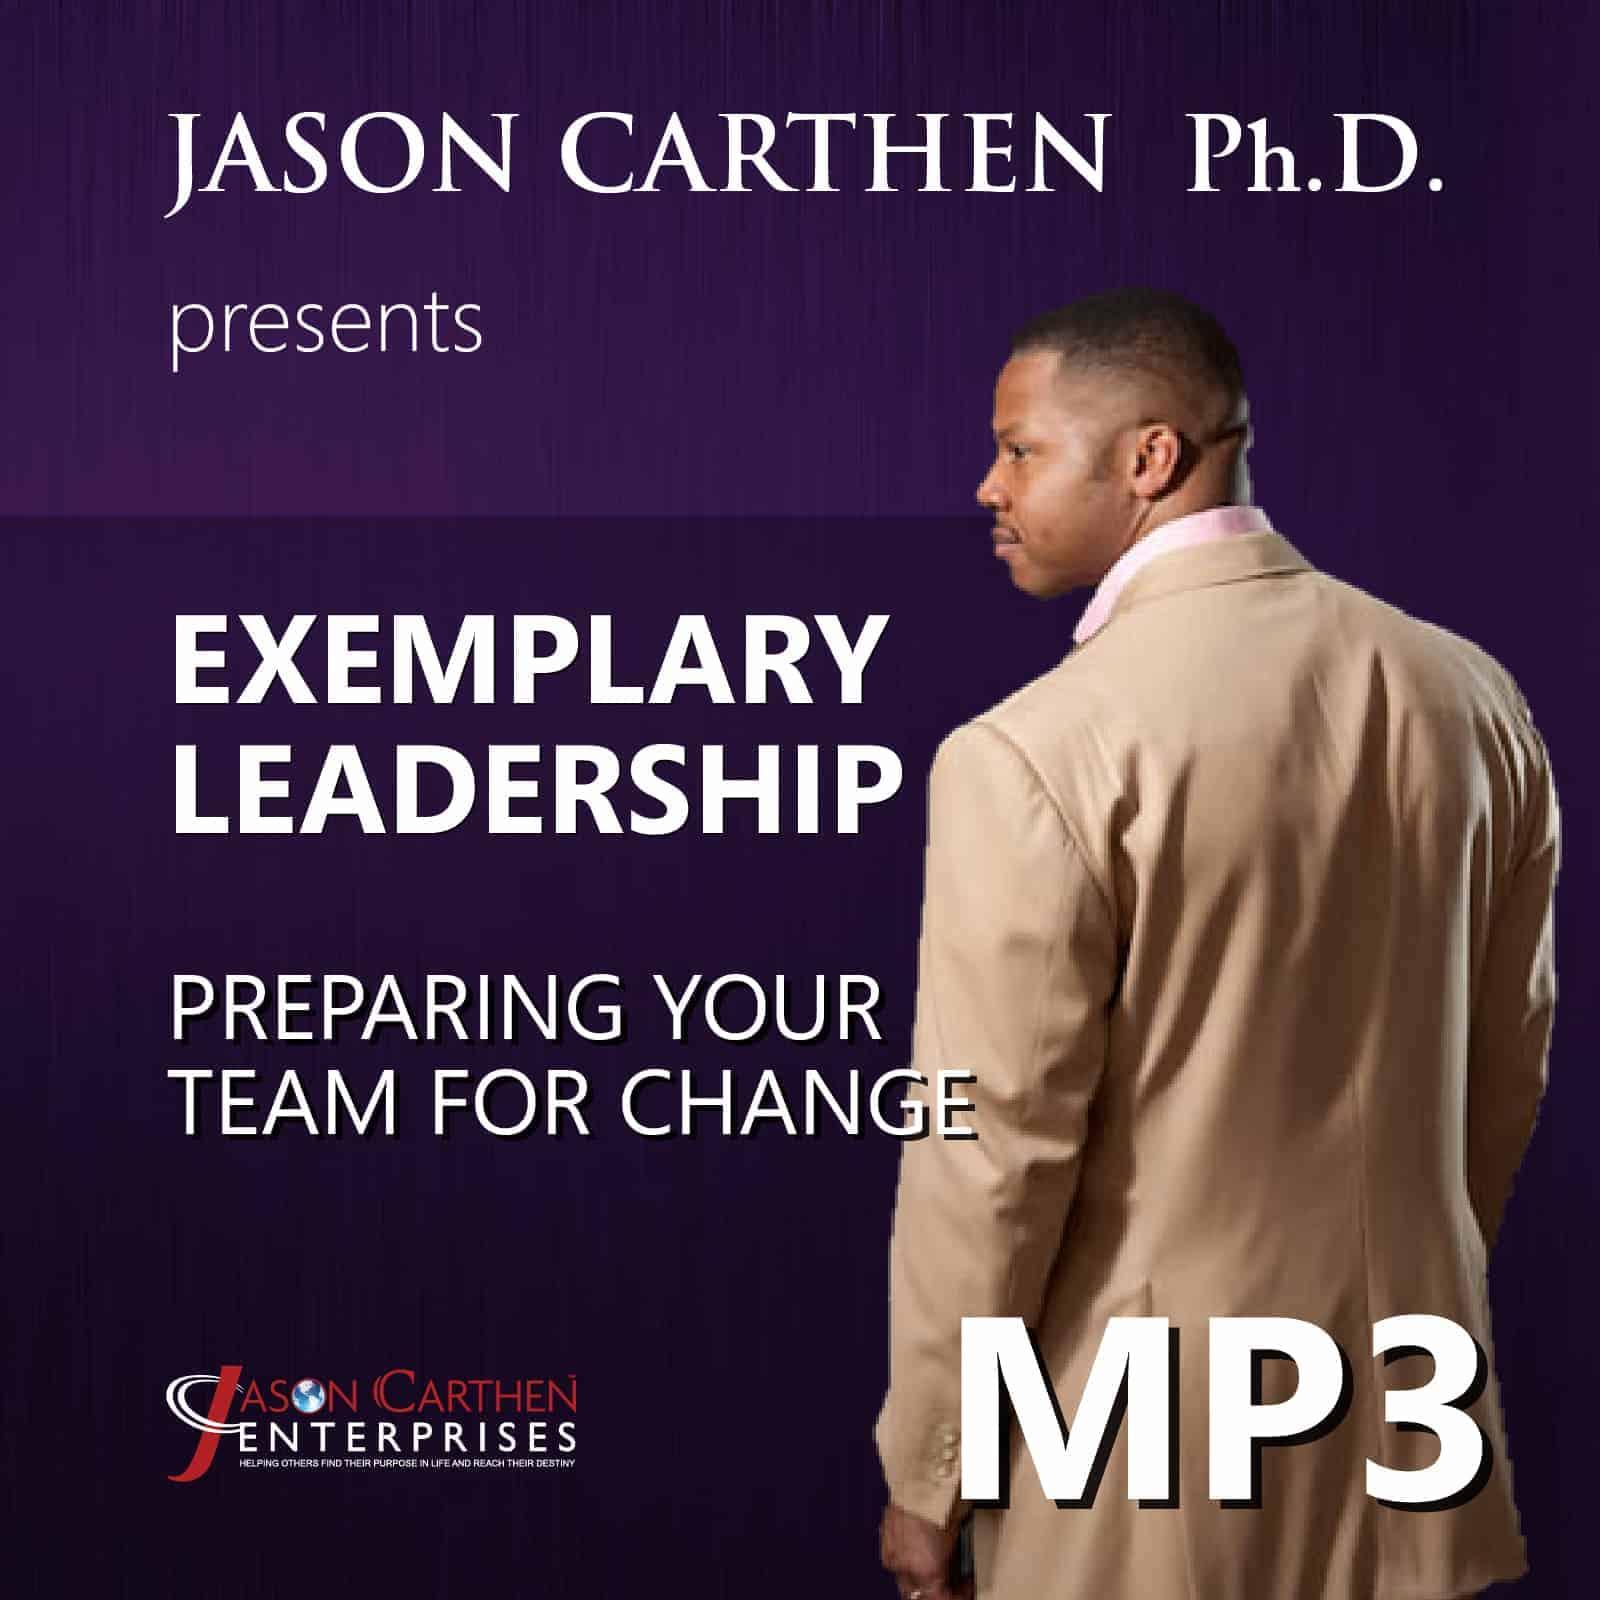 Dr. Jason Carthen: Preparing Your Team for Change.